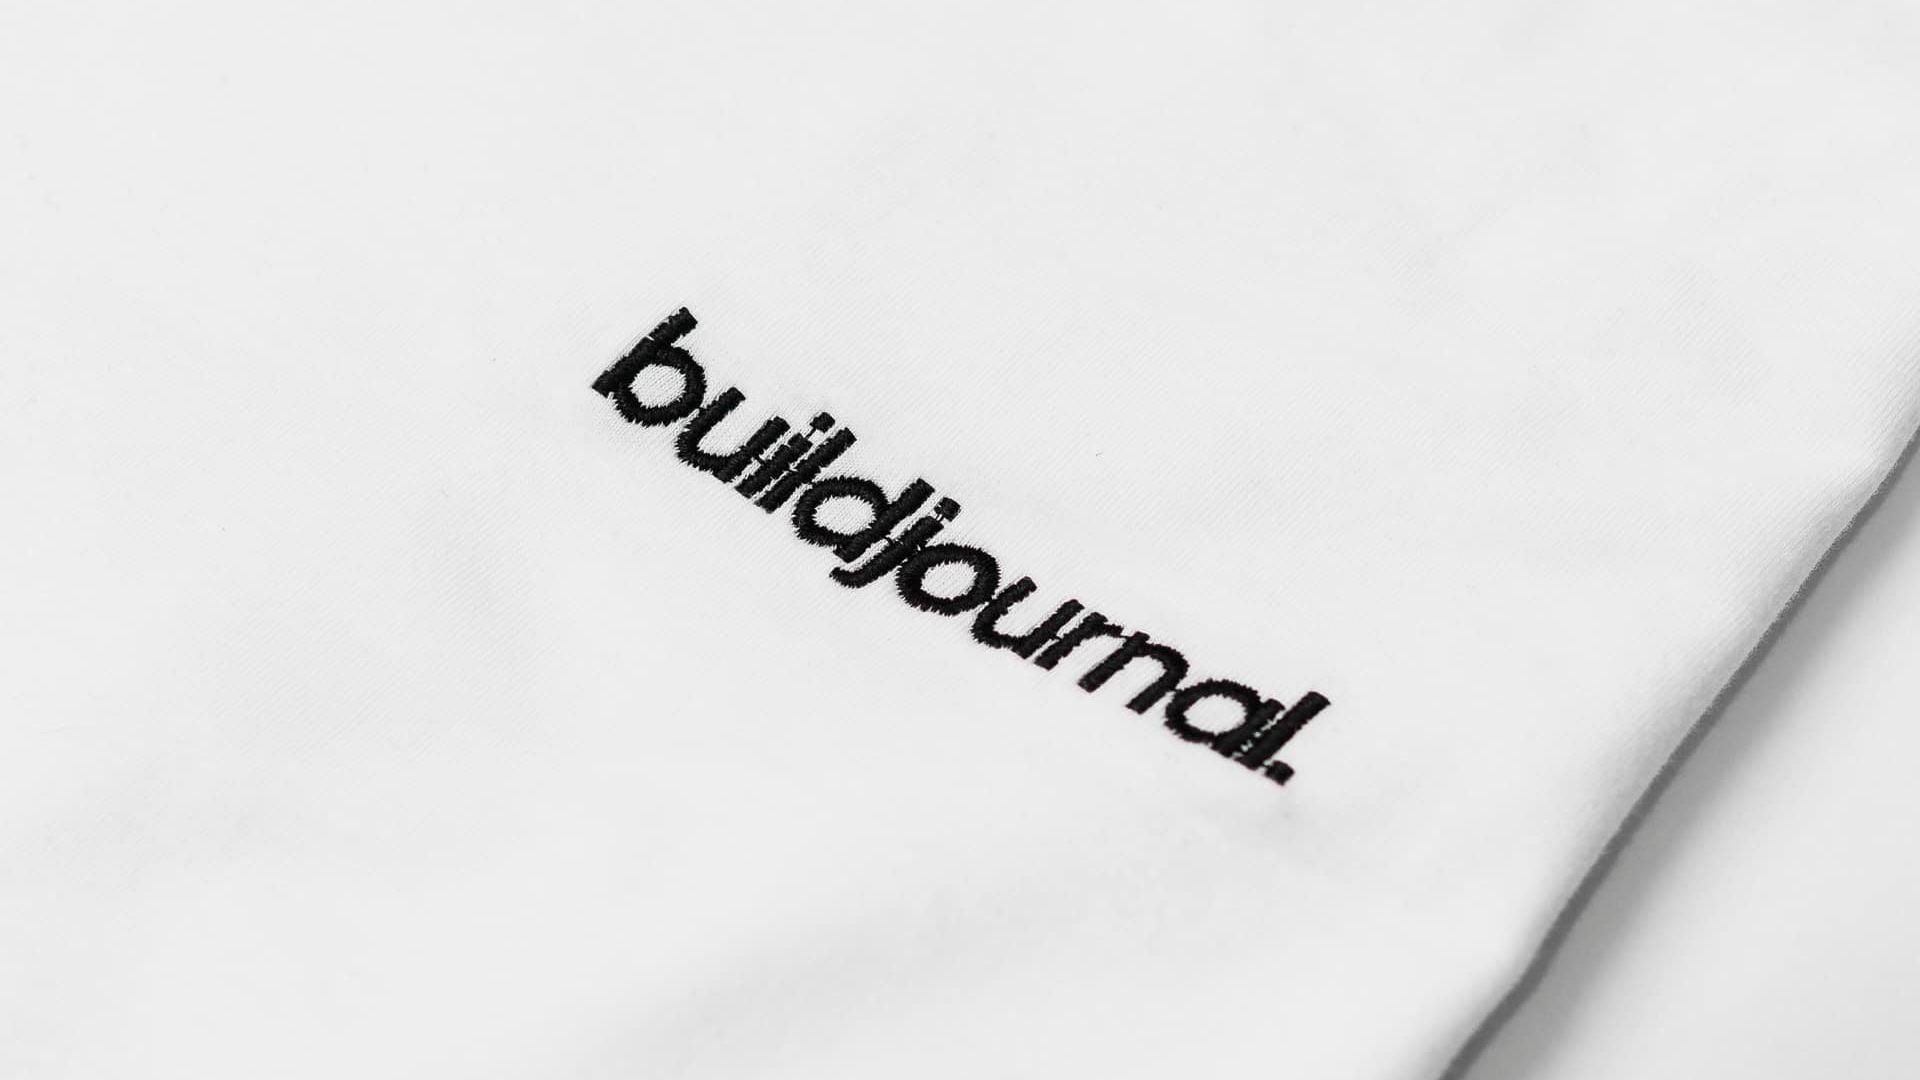 Buildjournal Signature 46 Tee Shirt